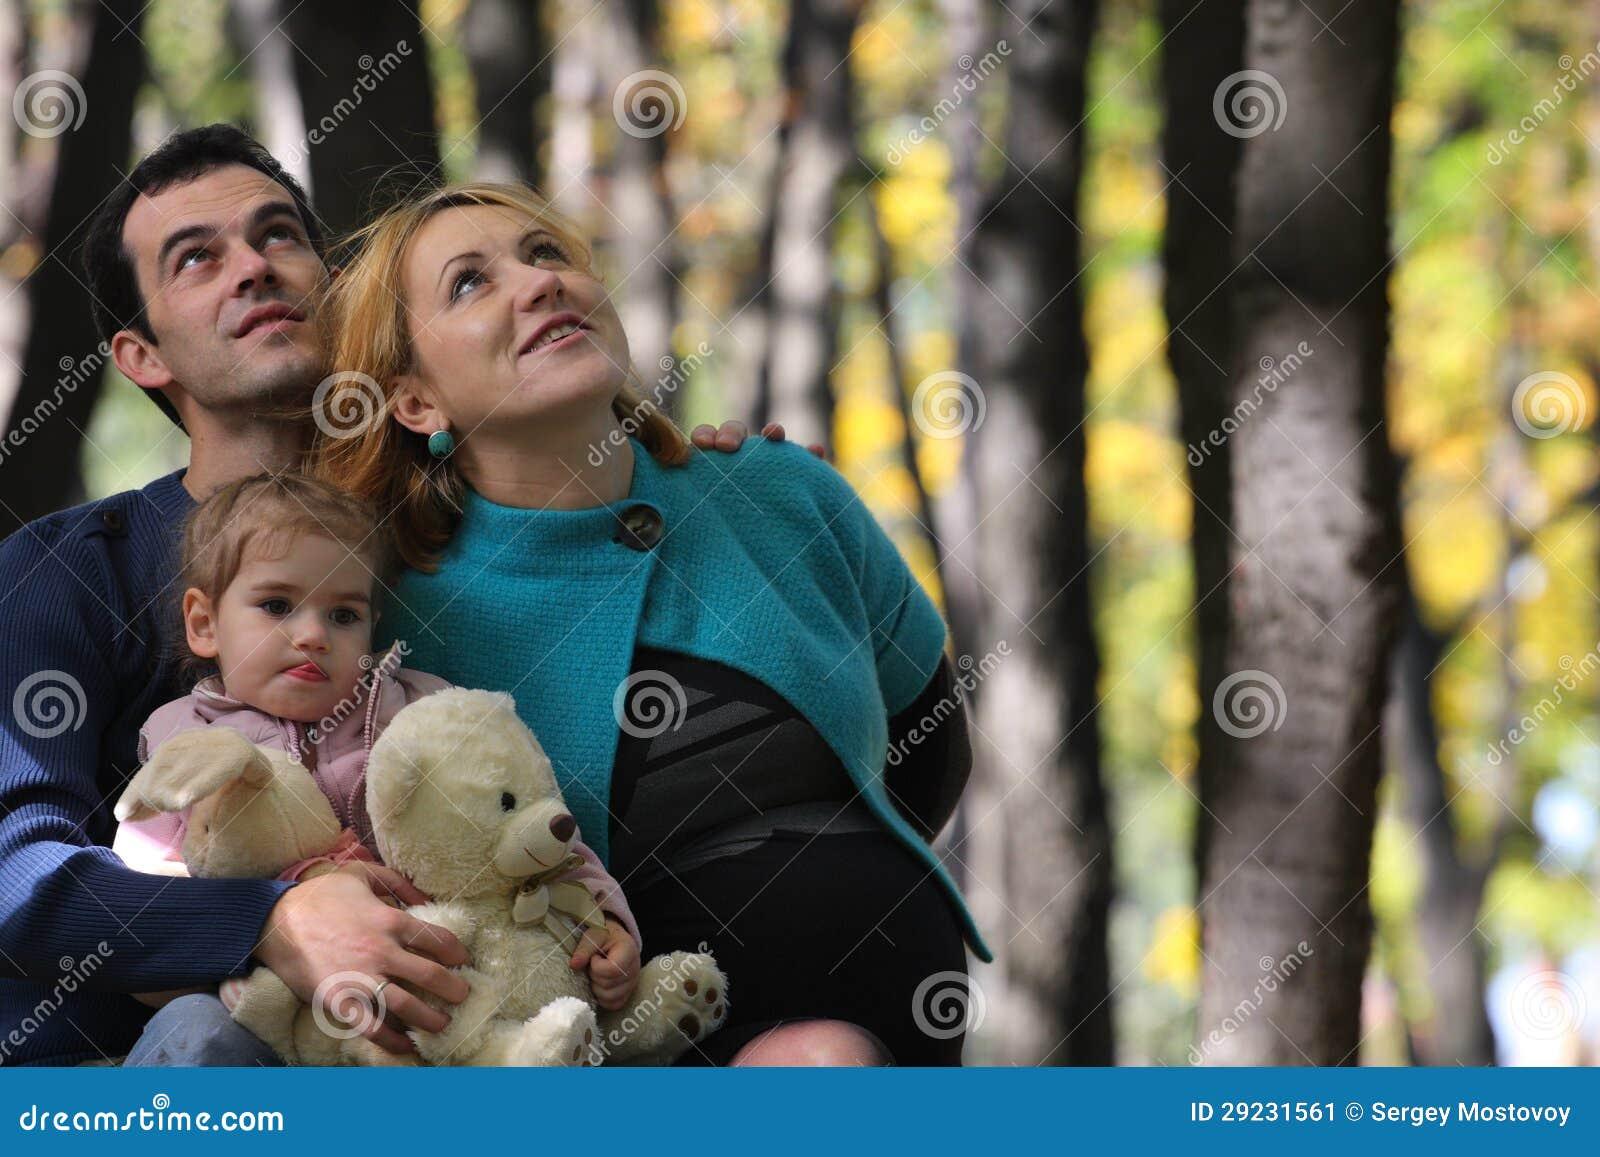 Download Família no parque imagem de stock. Imagem de lifestyles - 29231561